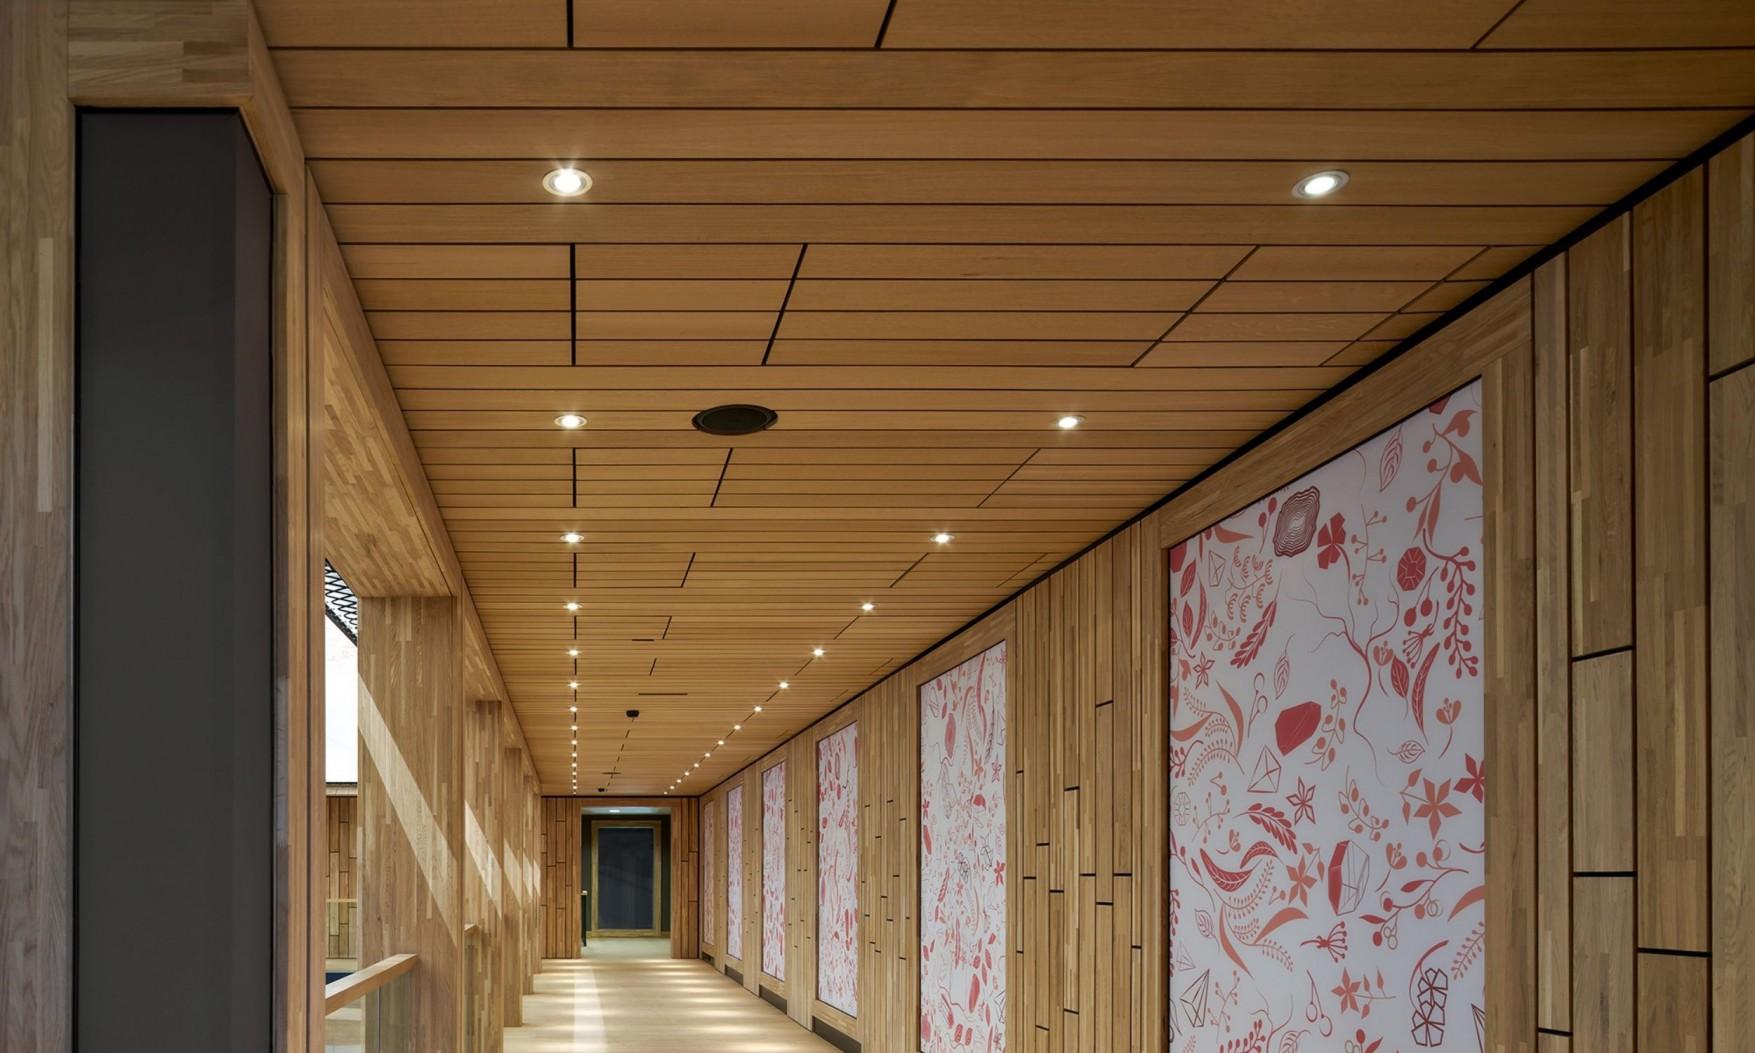 Harryvan Interieurbouw | latten plafond en wandbekleding (Naturalis Leiden)